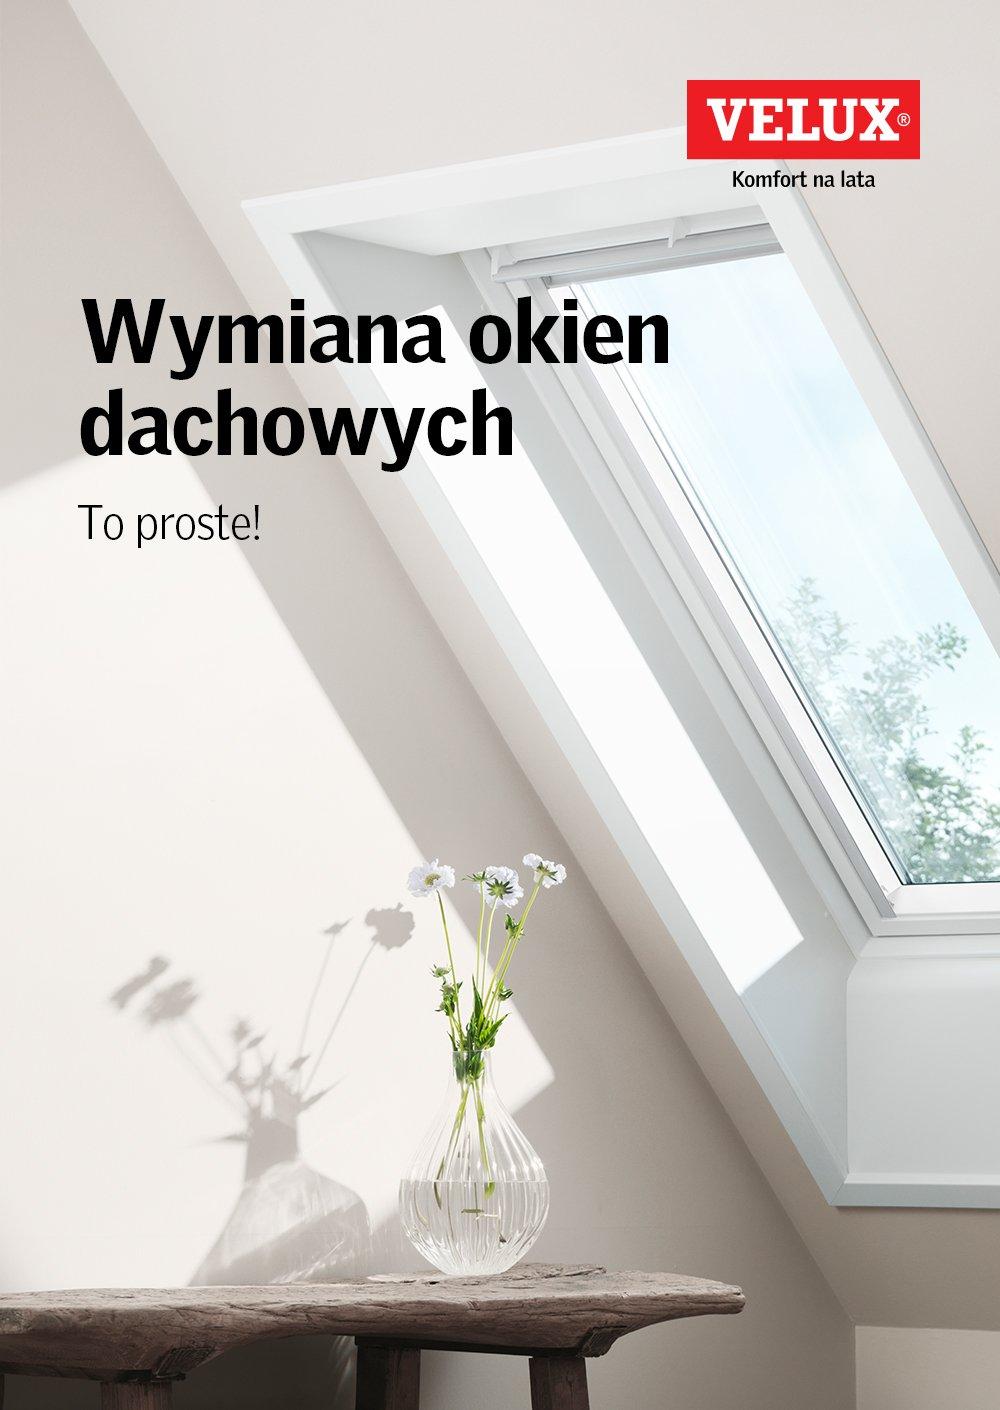 VELUX_okladka_remonty_wymiany_1.jpg